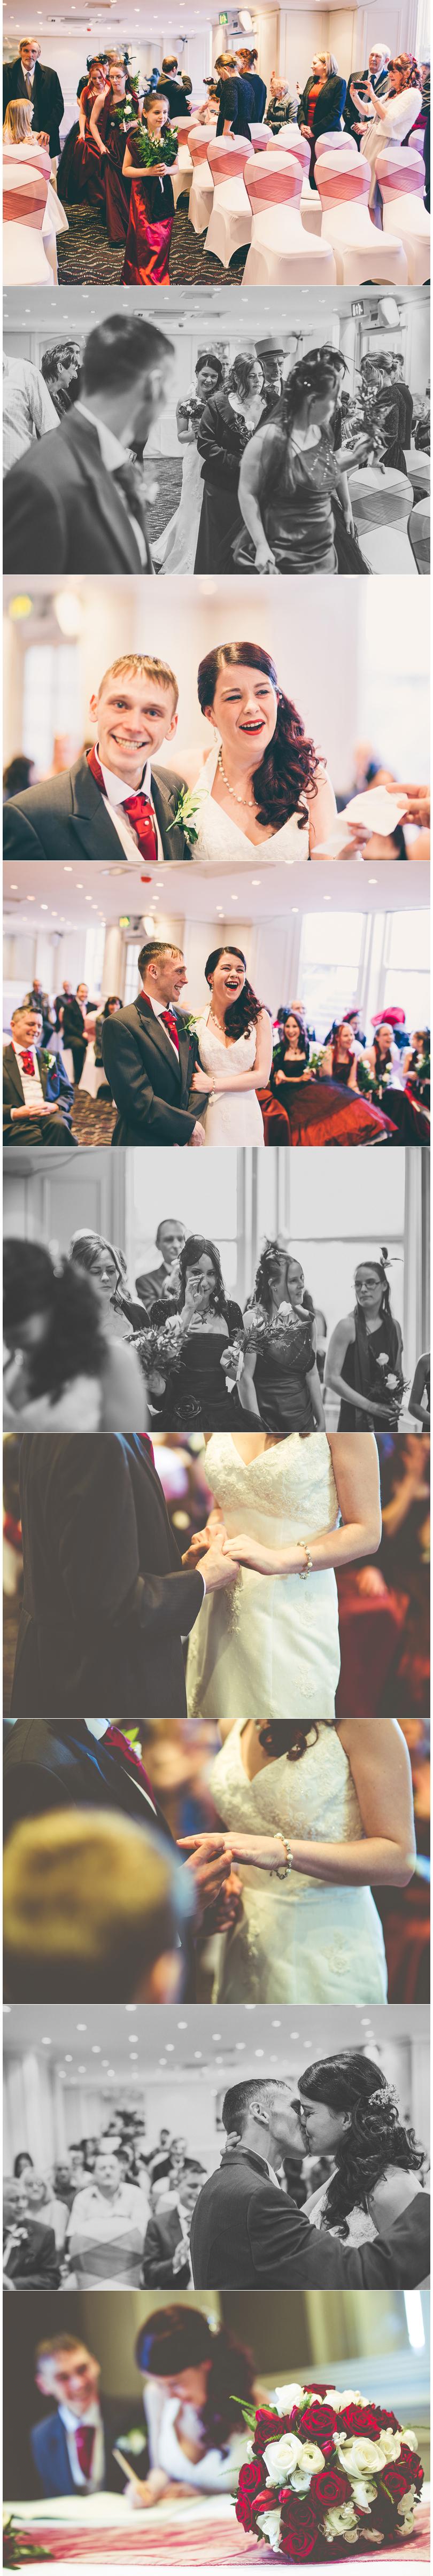 Neil_Jackson_Photographic_Scarborough_York_Yorkshire_Wedding_Photographer_Jo_Ash_Ambassador_Spa_Hotel_Scarborough_Wedding_Blog4